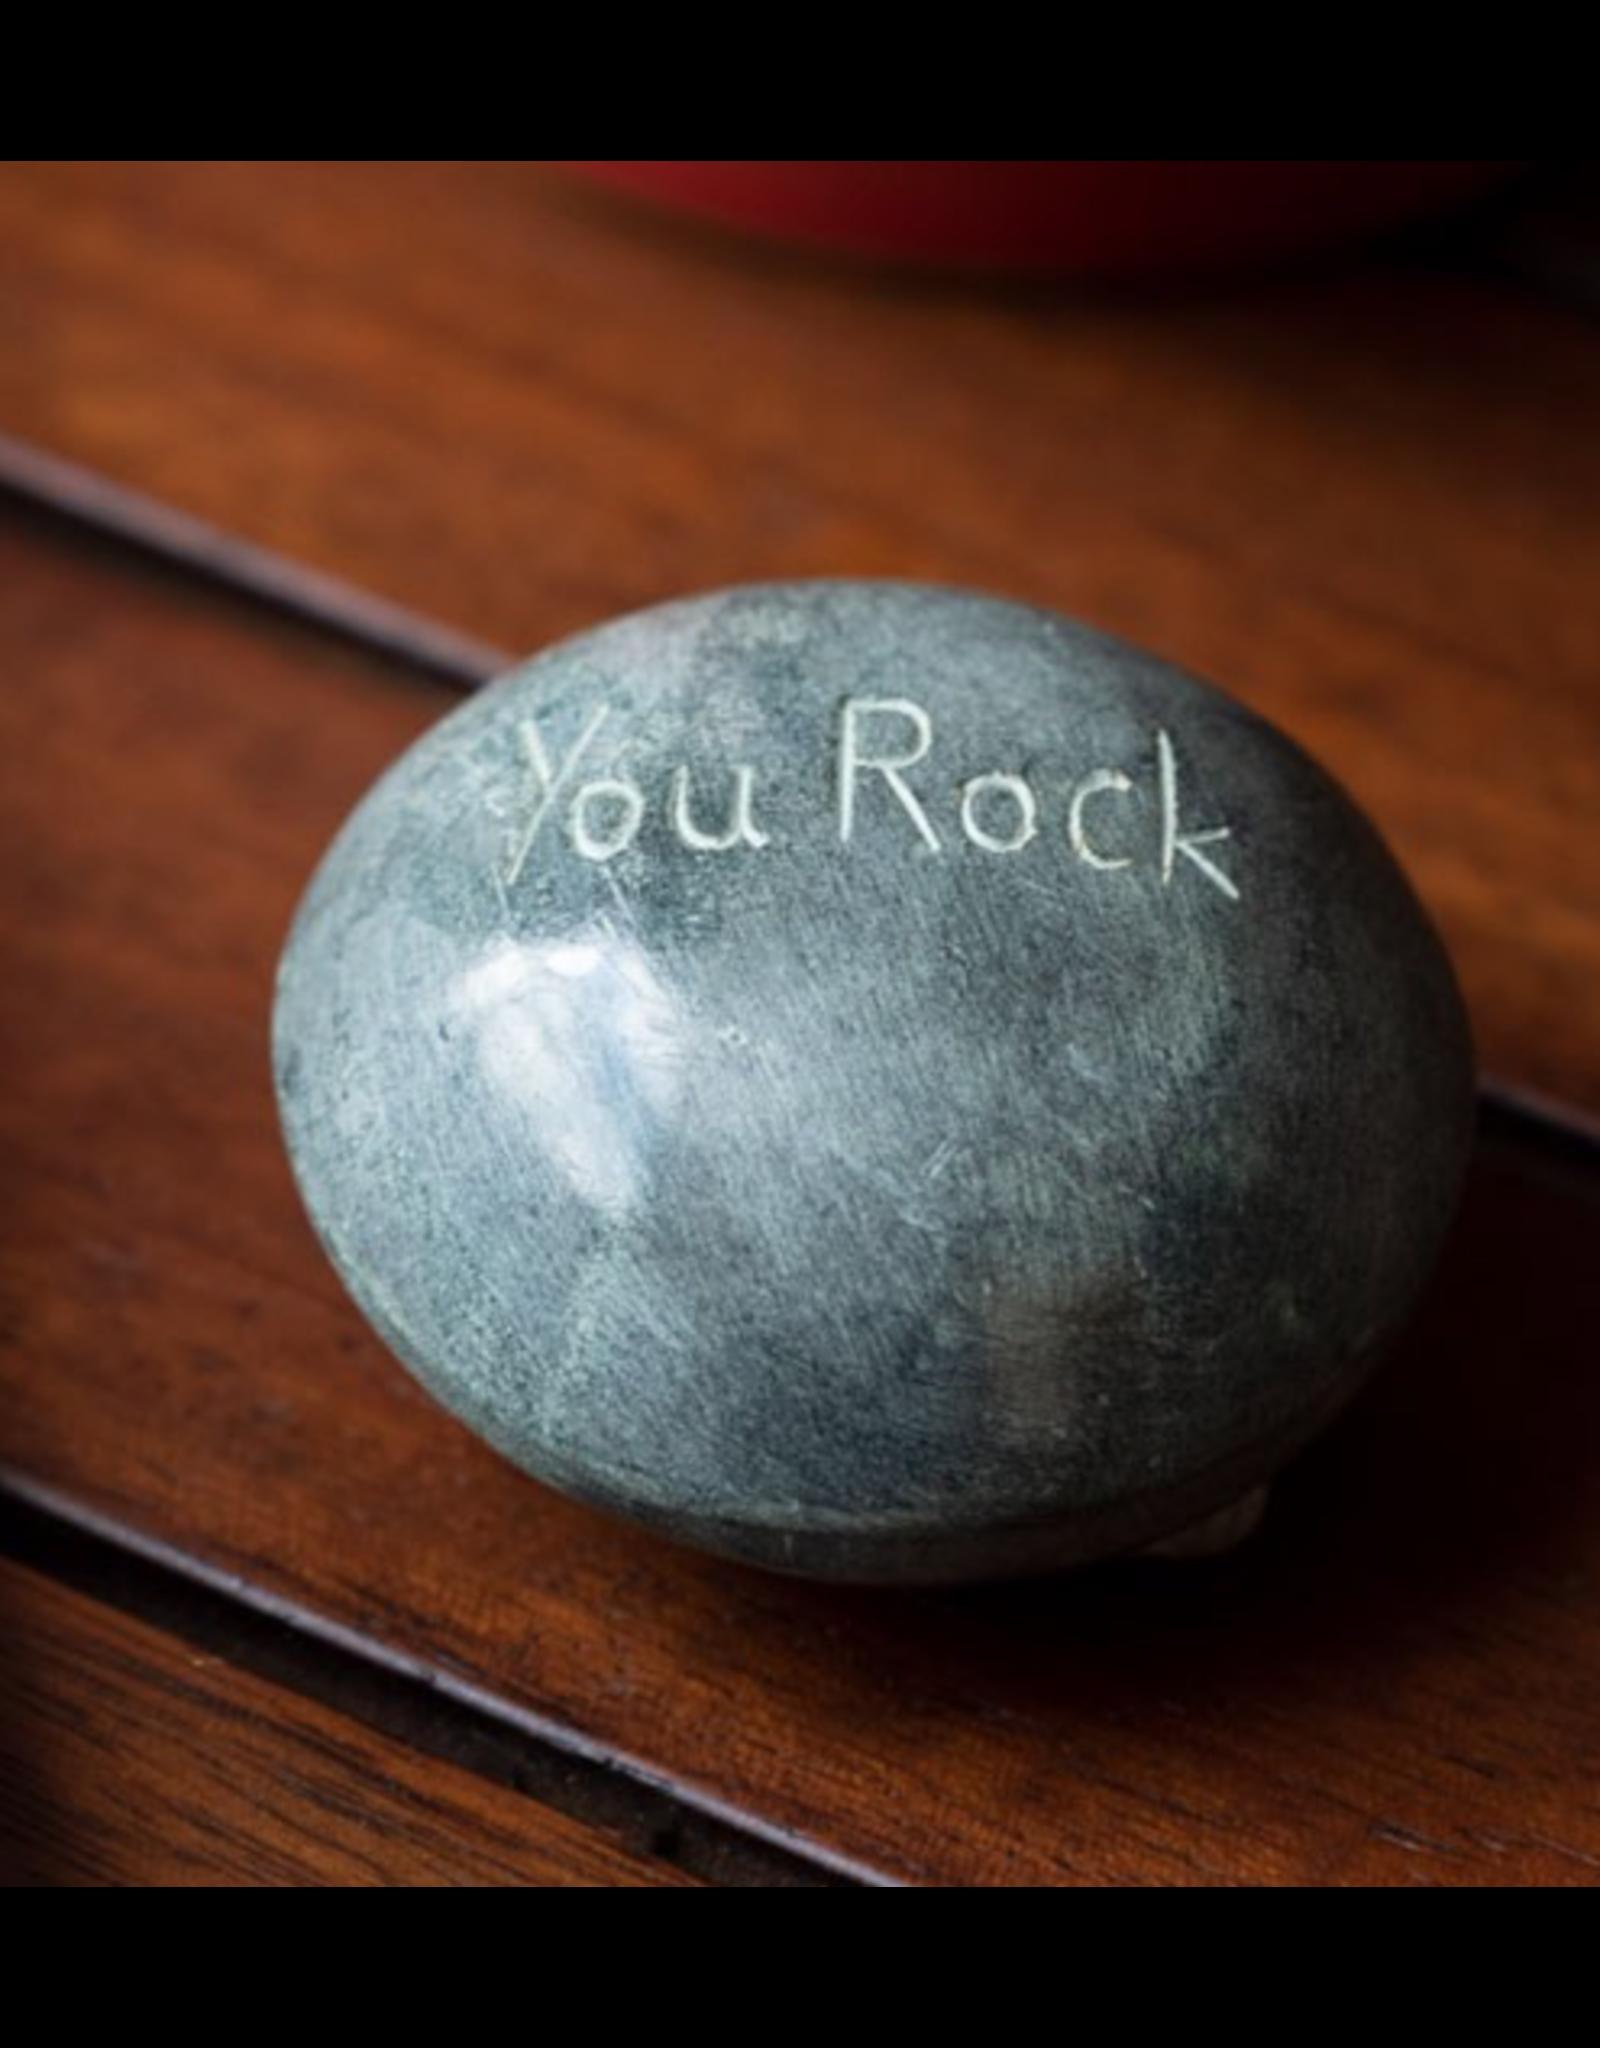 You Rock! Rock Soapstone